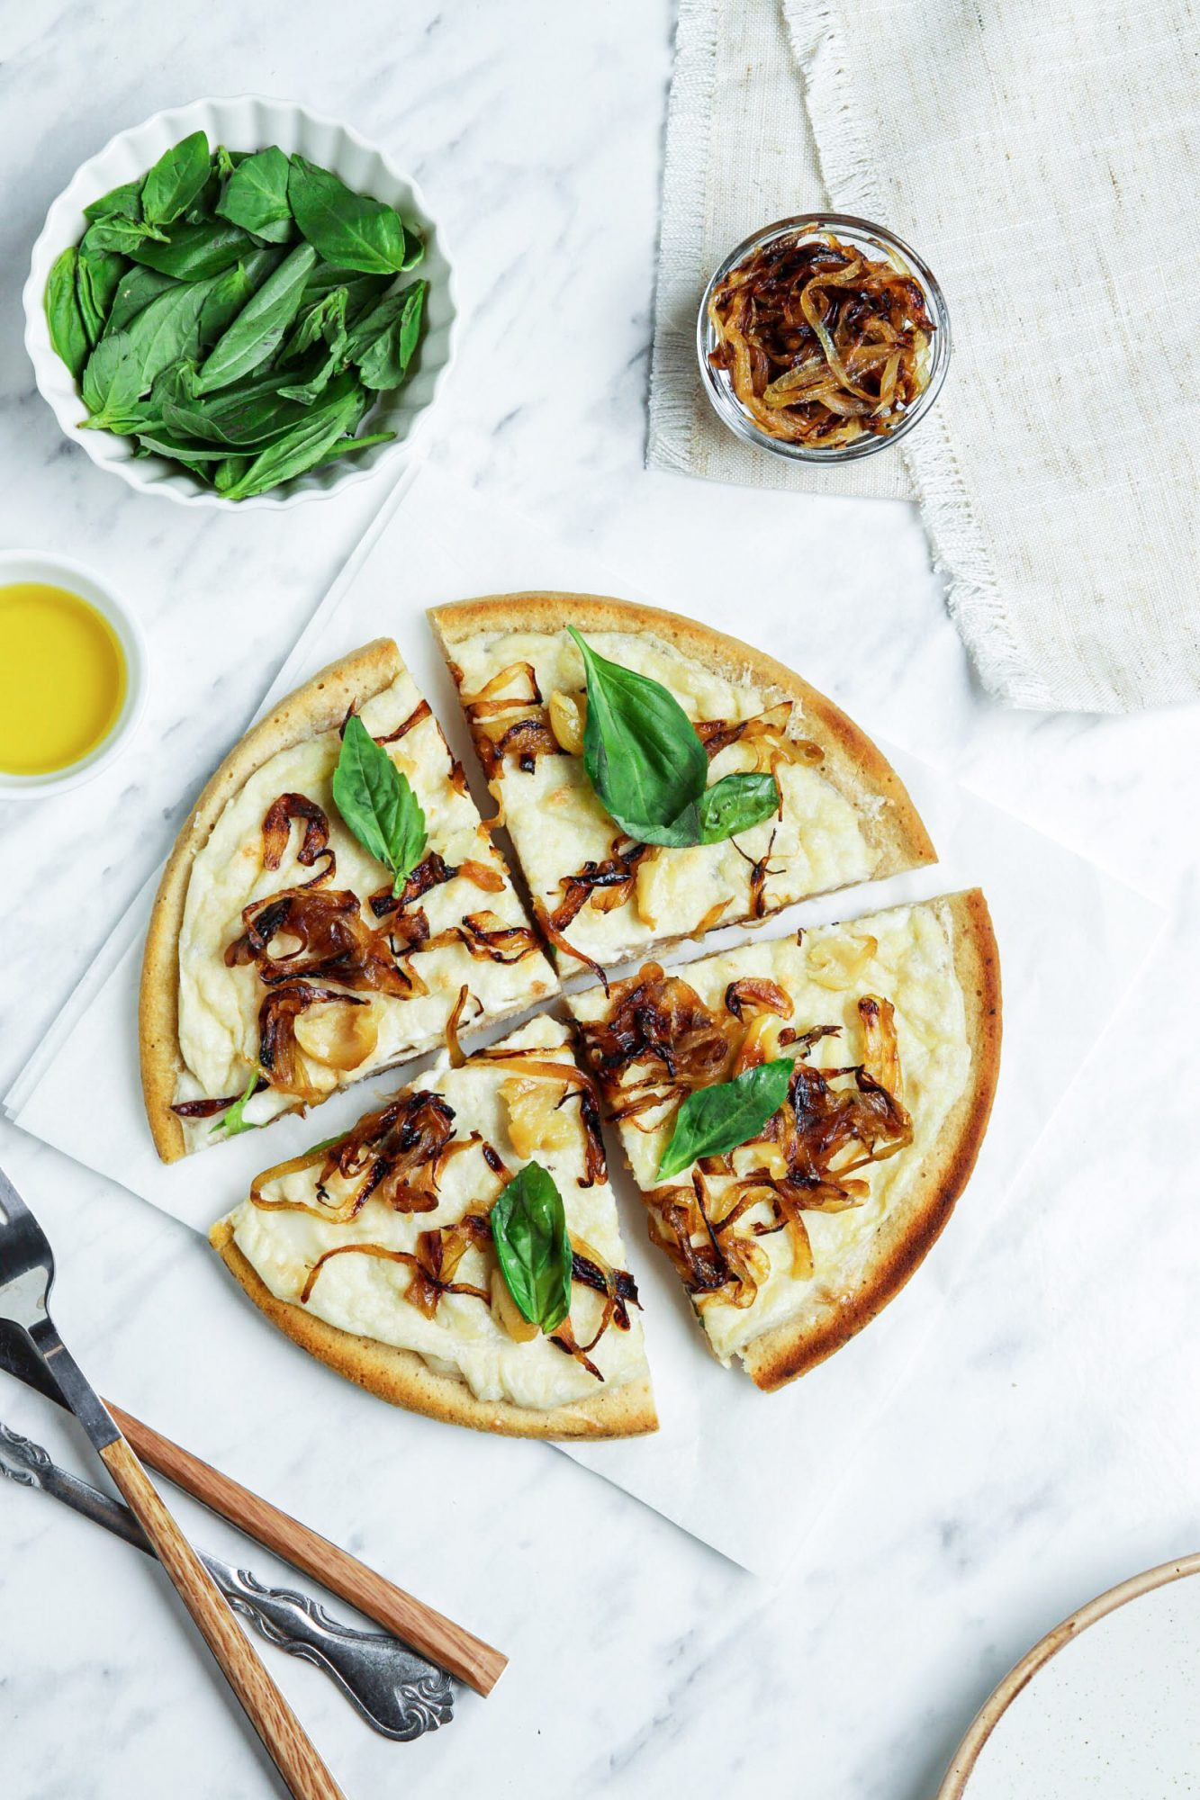 Vegan Pizza Toppings